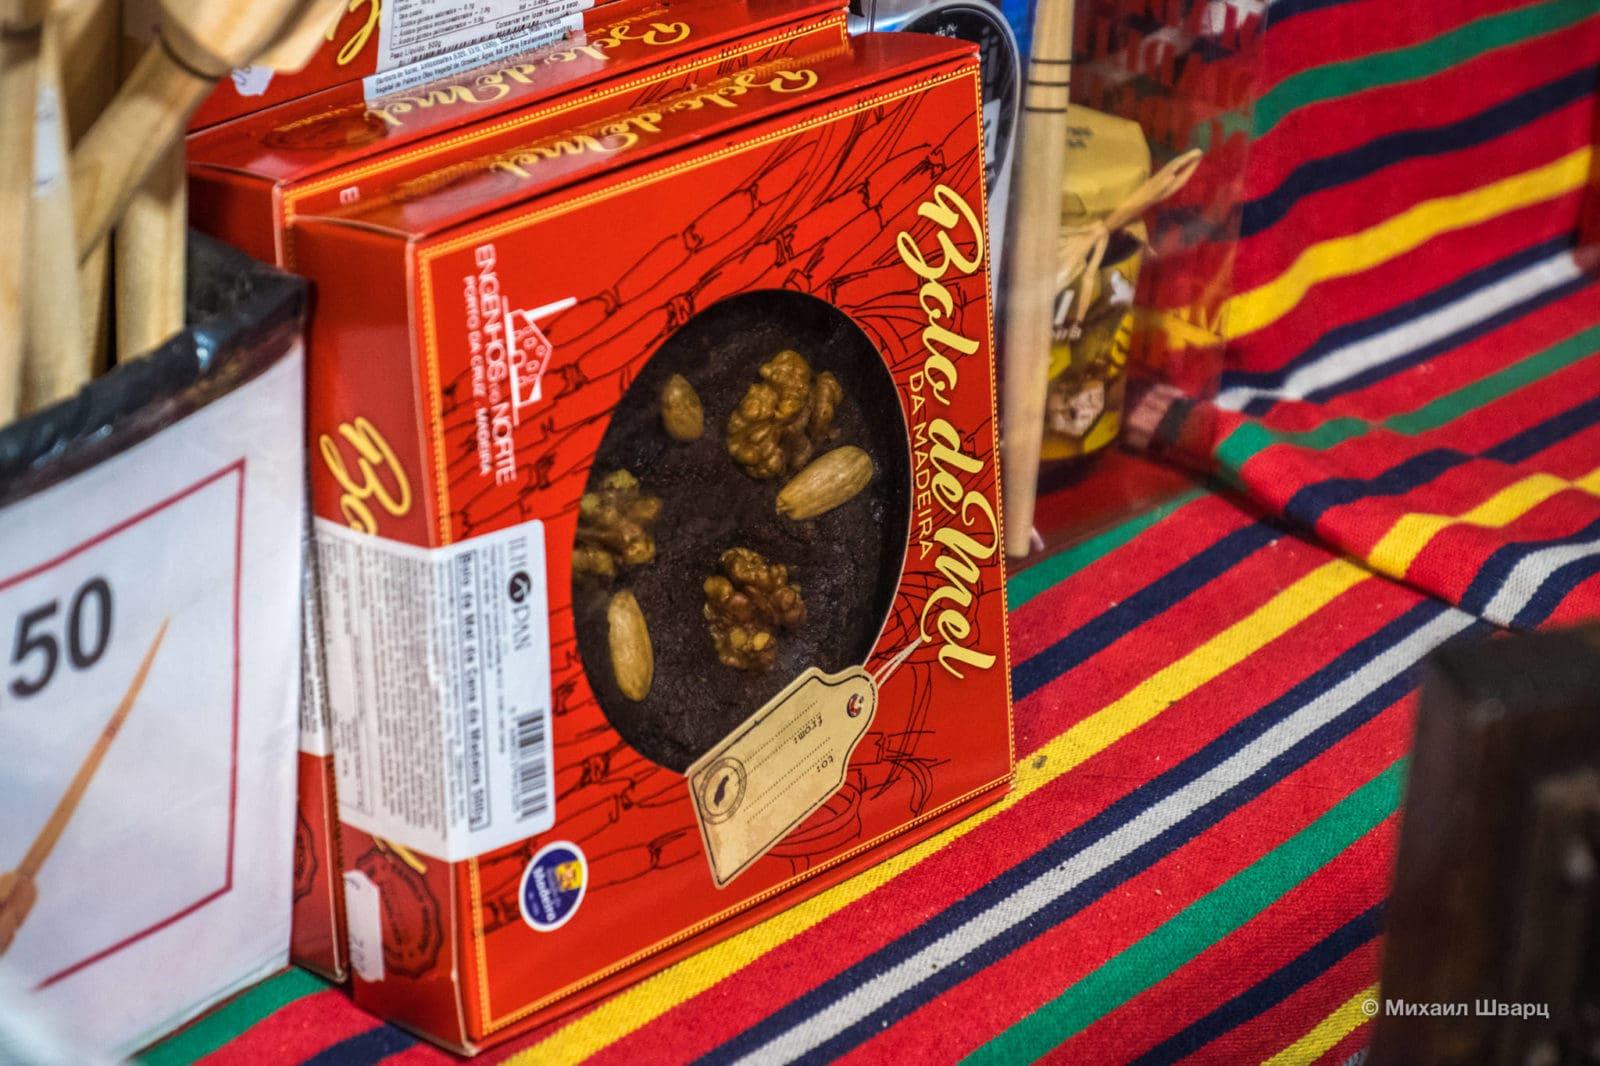 Bolo de mel de cana – медовый торт из тростника